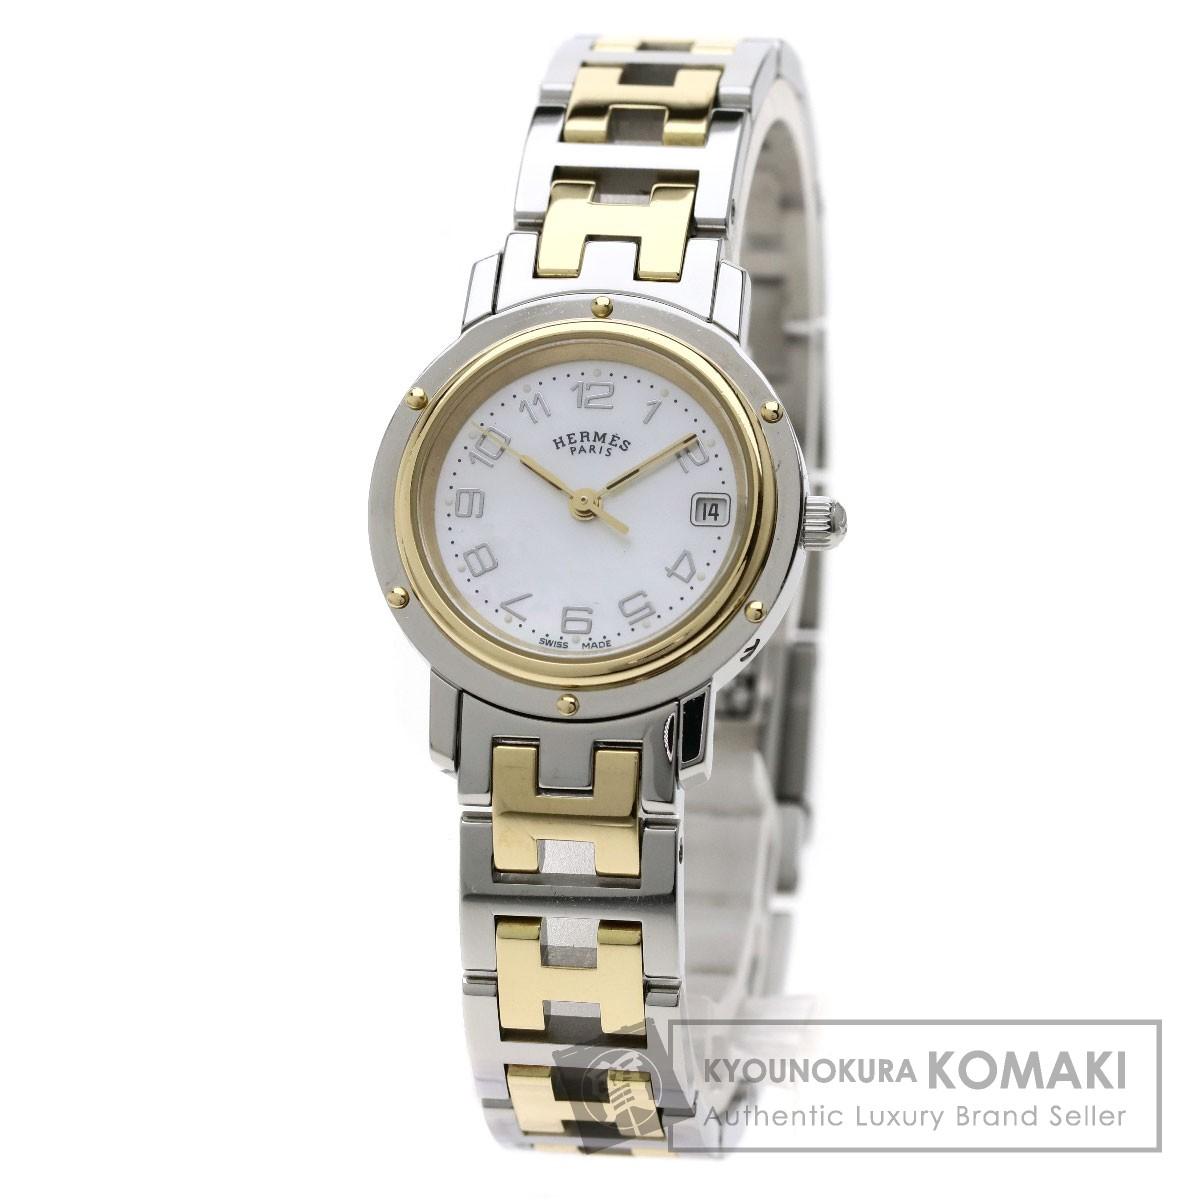 HERMES CL4.220 クリッパーナクレ 腕時計 ステンレススチール/SSxGP レディース 【中古】【エルメス】